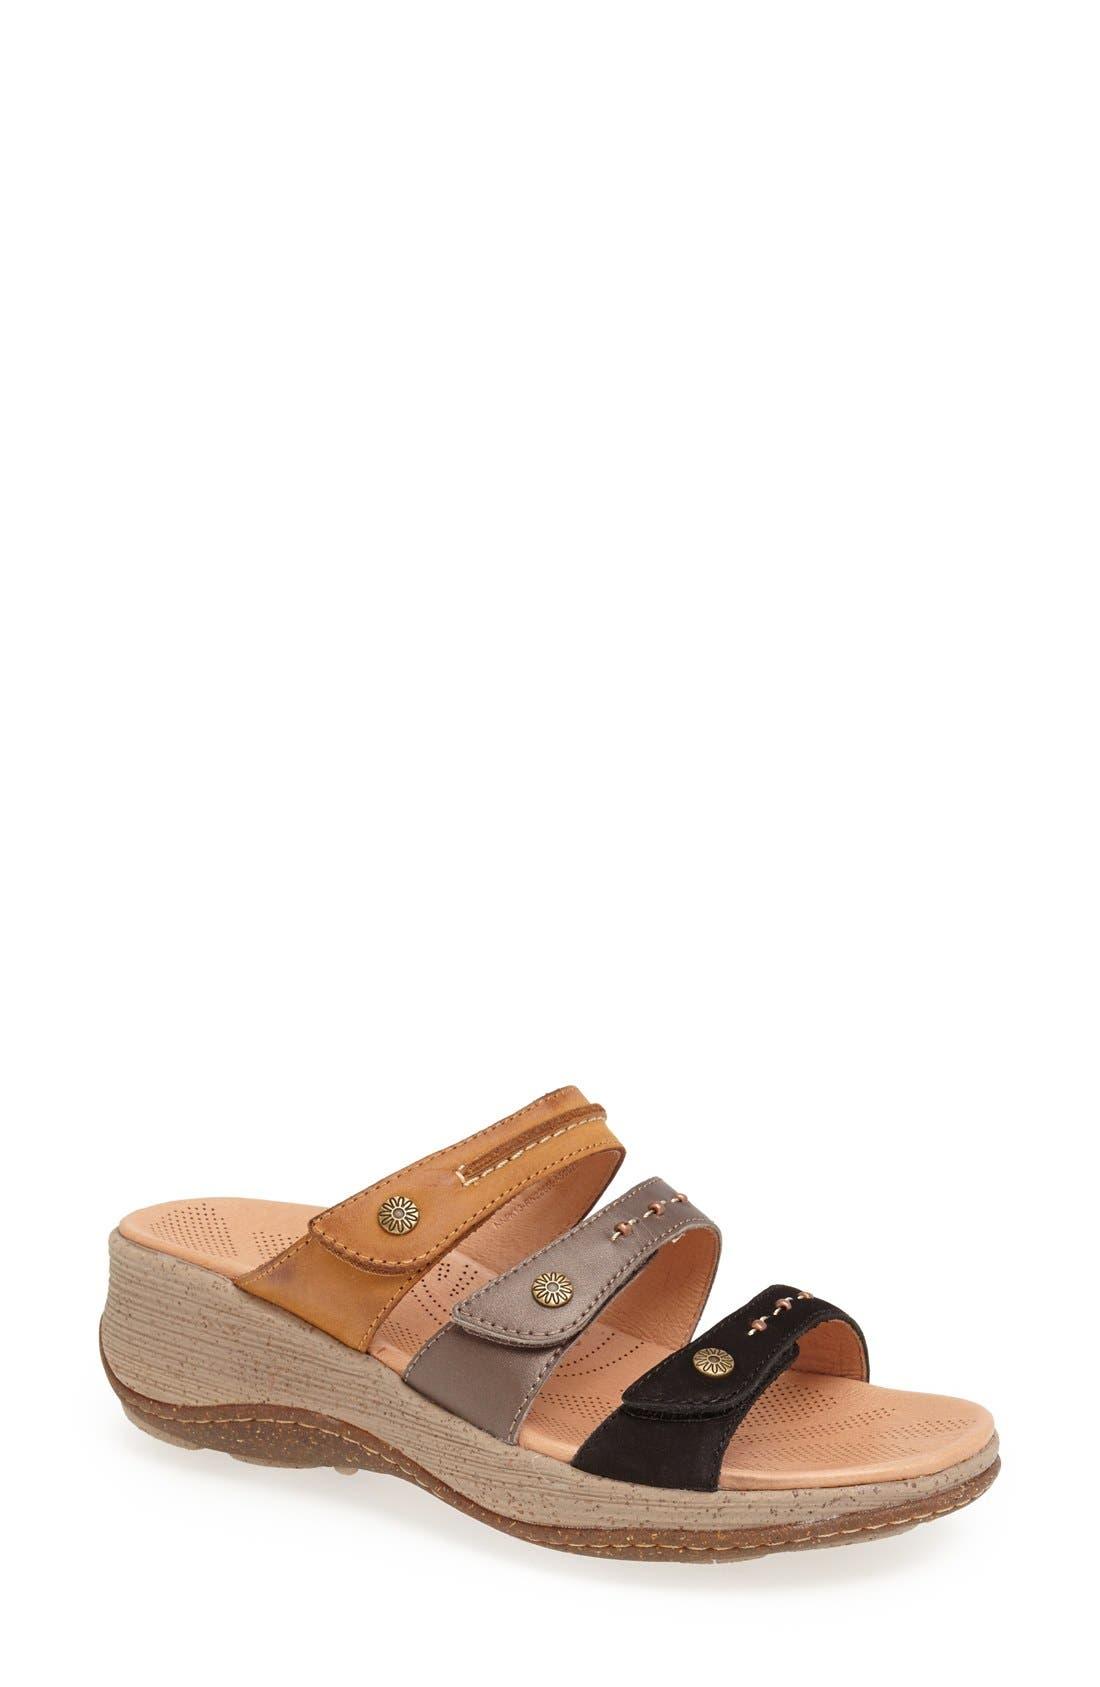 Alternate Image 1 Selected - Acorn 'Vista' Wedge Sandal (Women)